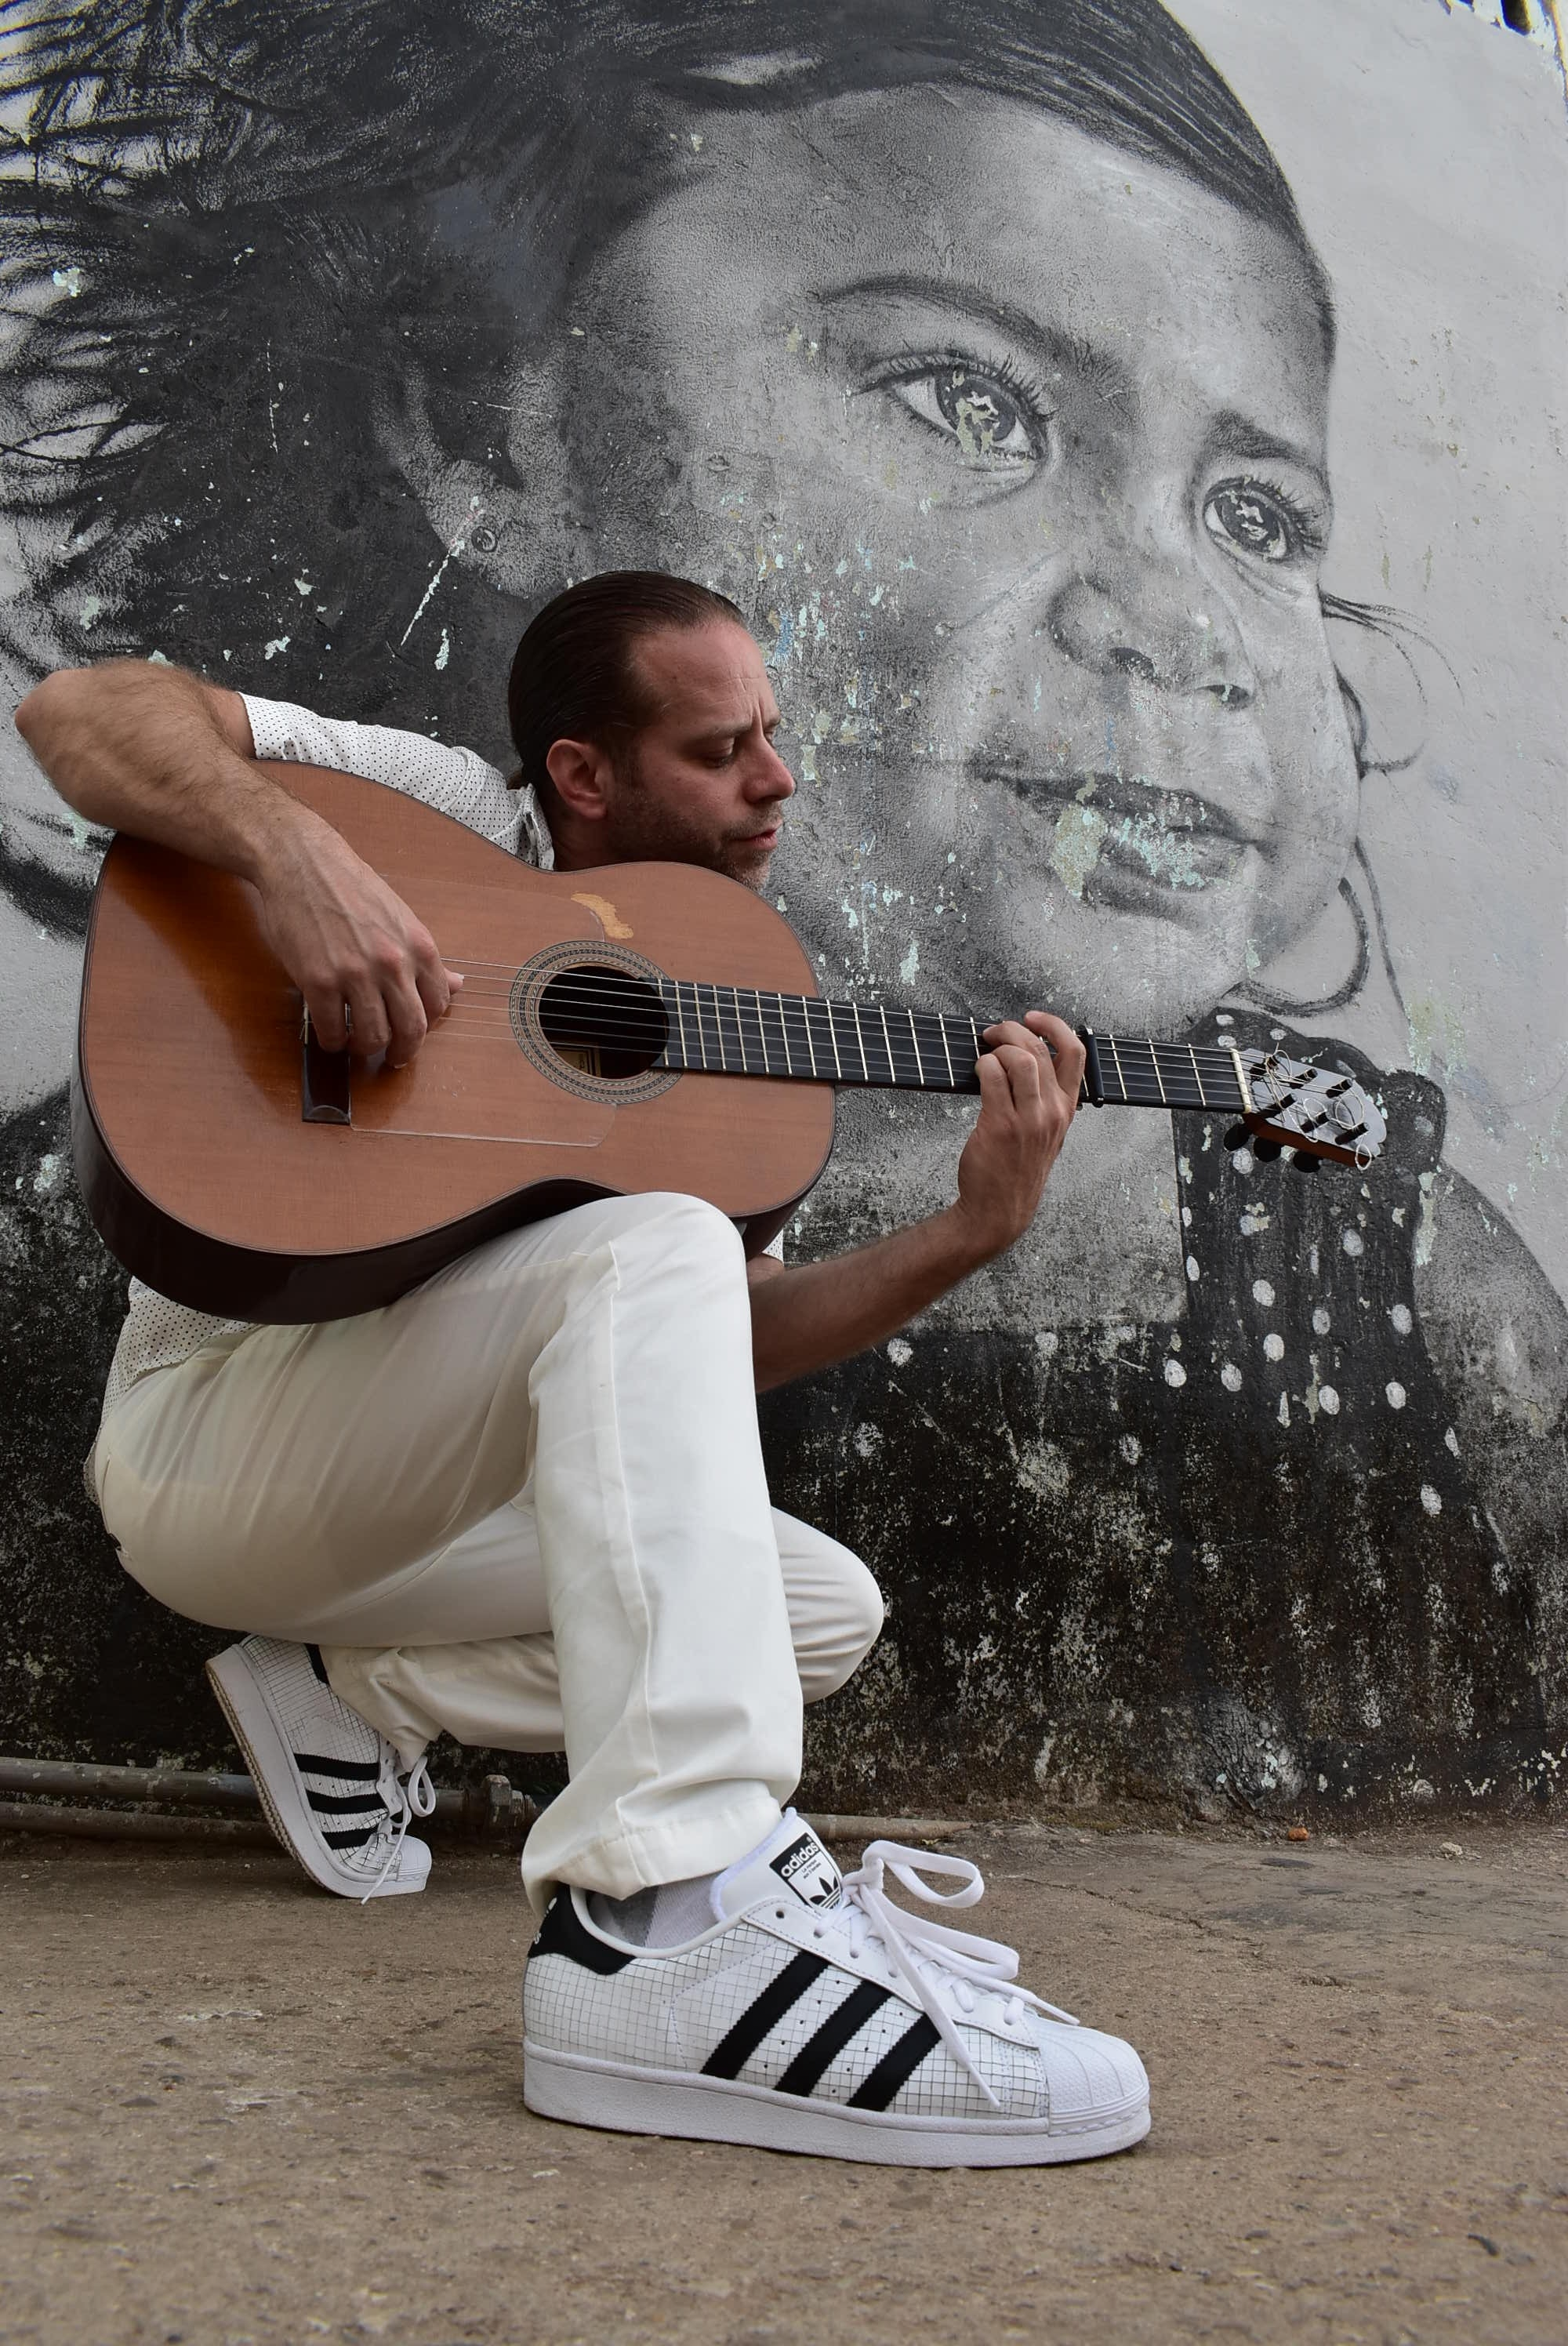 Rockin'the Adidas in Miramar, Cuba. Photo credit  Muse Corp NY